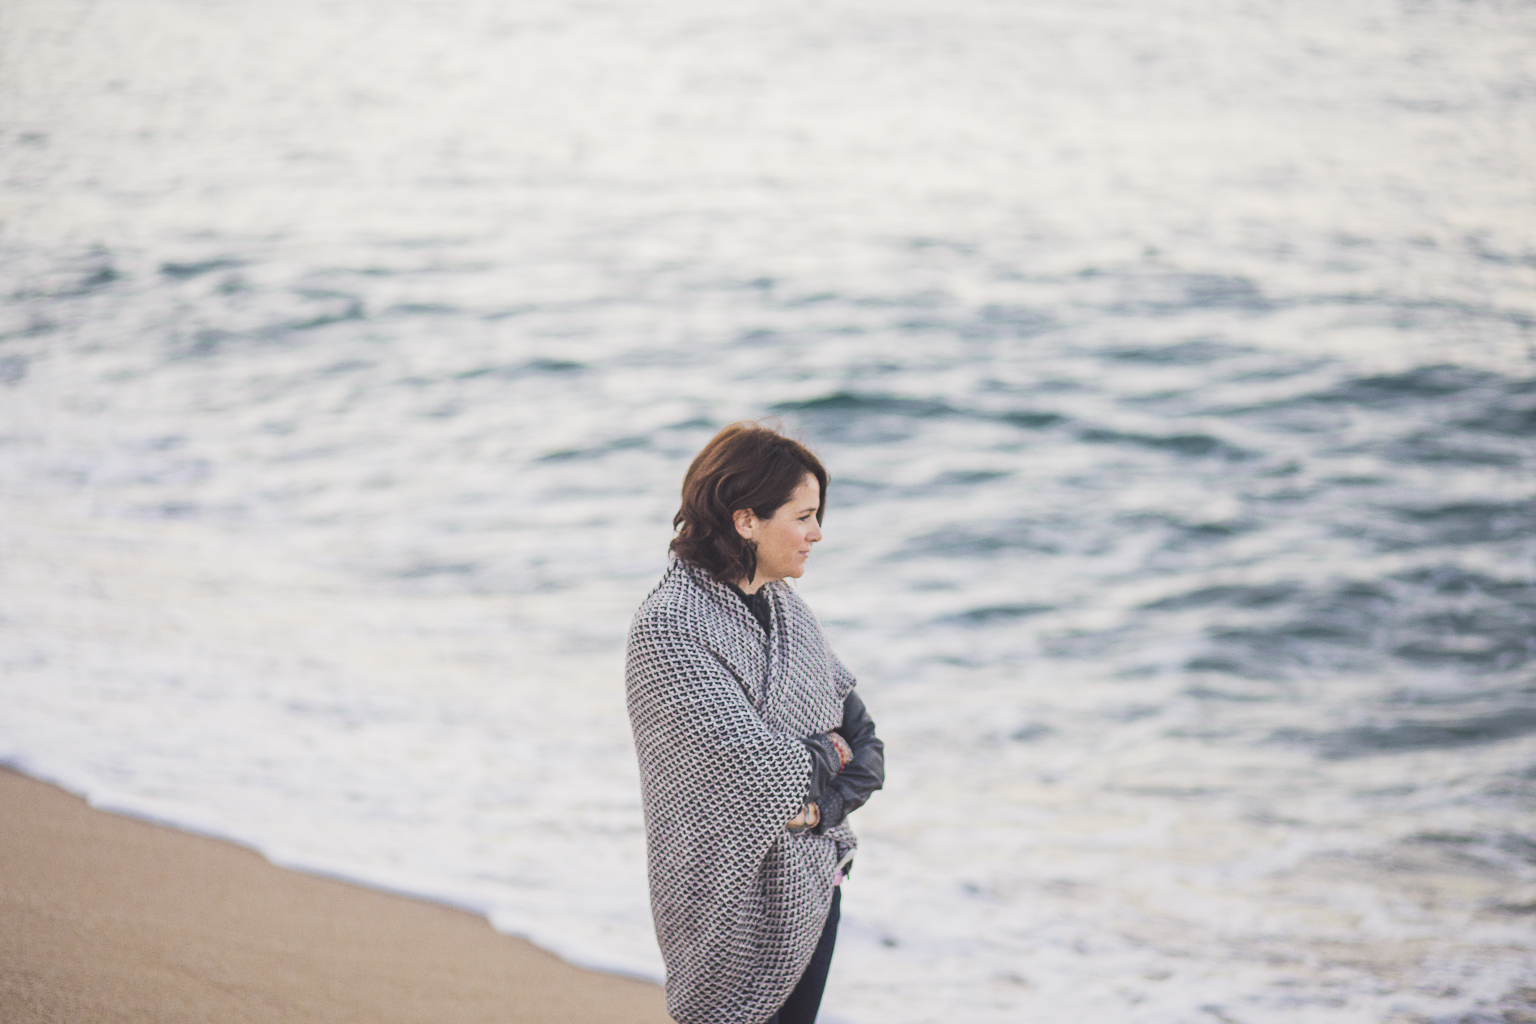 Book fotográfico empresarial :: Reportaje en la costa brava :: fotógrafo book empresarial :: book de empresa :: fotografía personal :: fotografía natural en la playa :: Fotógrafo Lloret de Mar